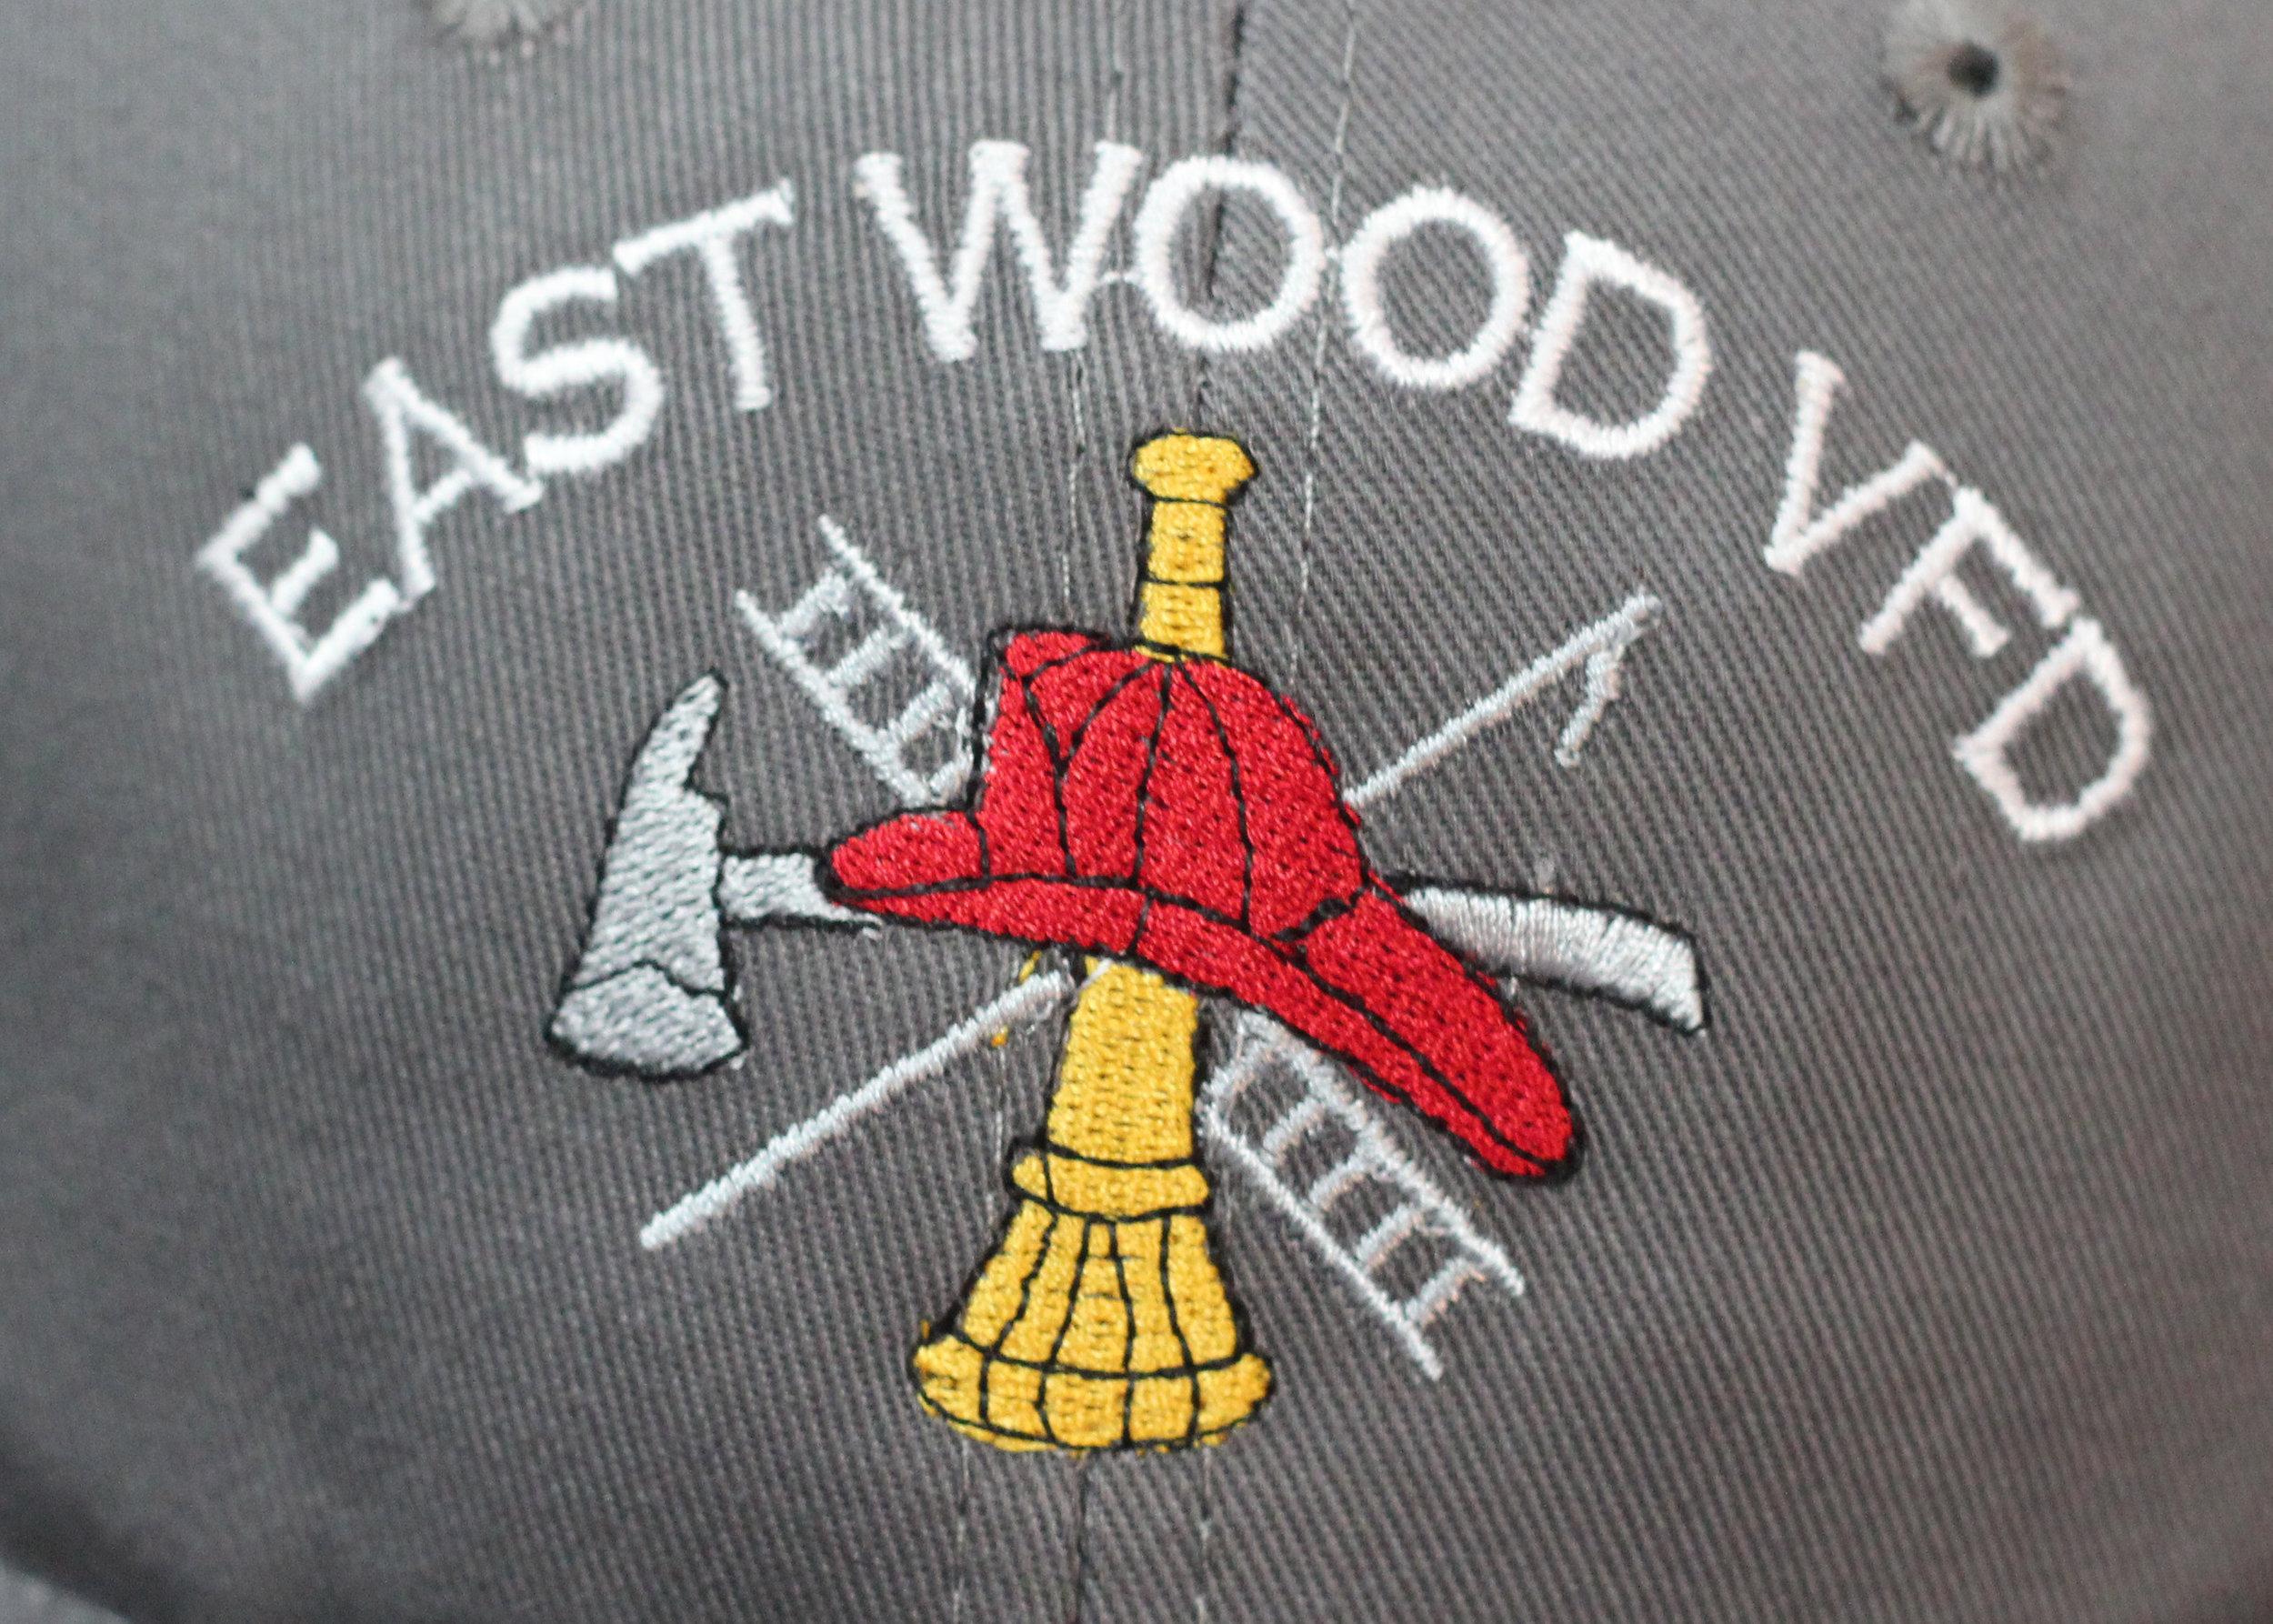 Eastwood Vol Fire Dept